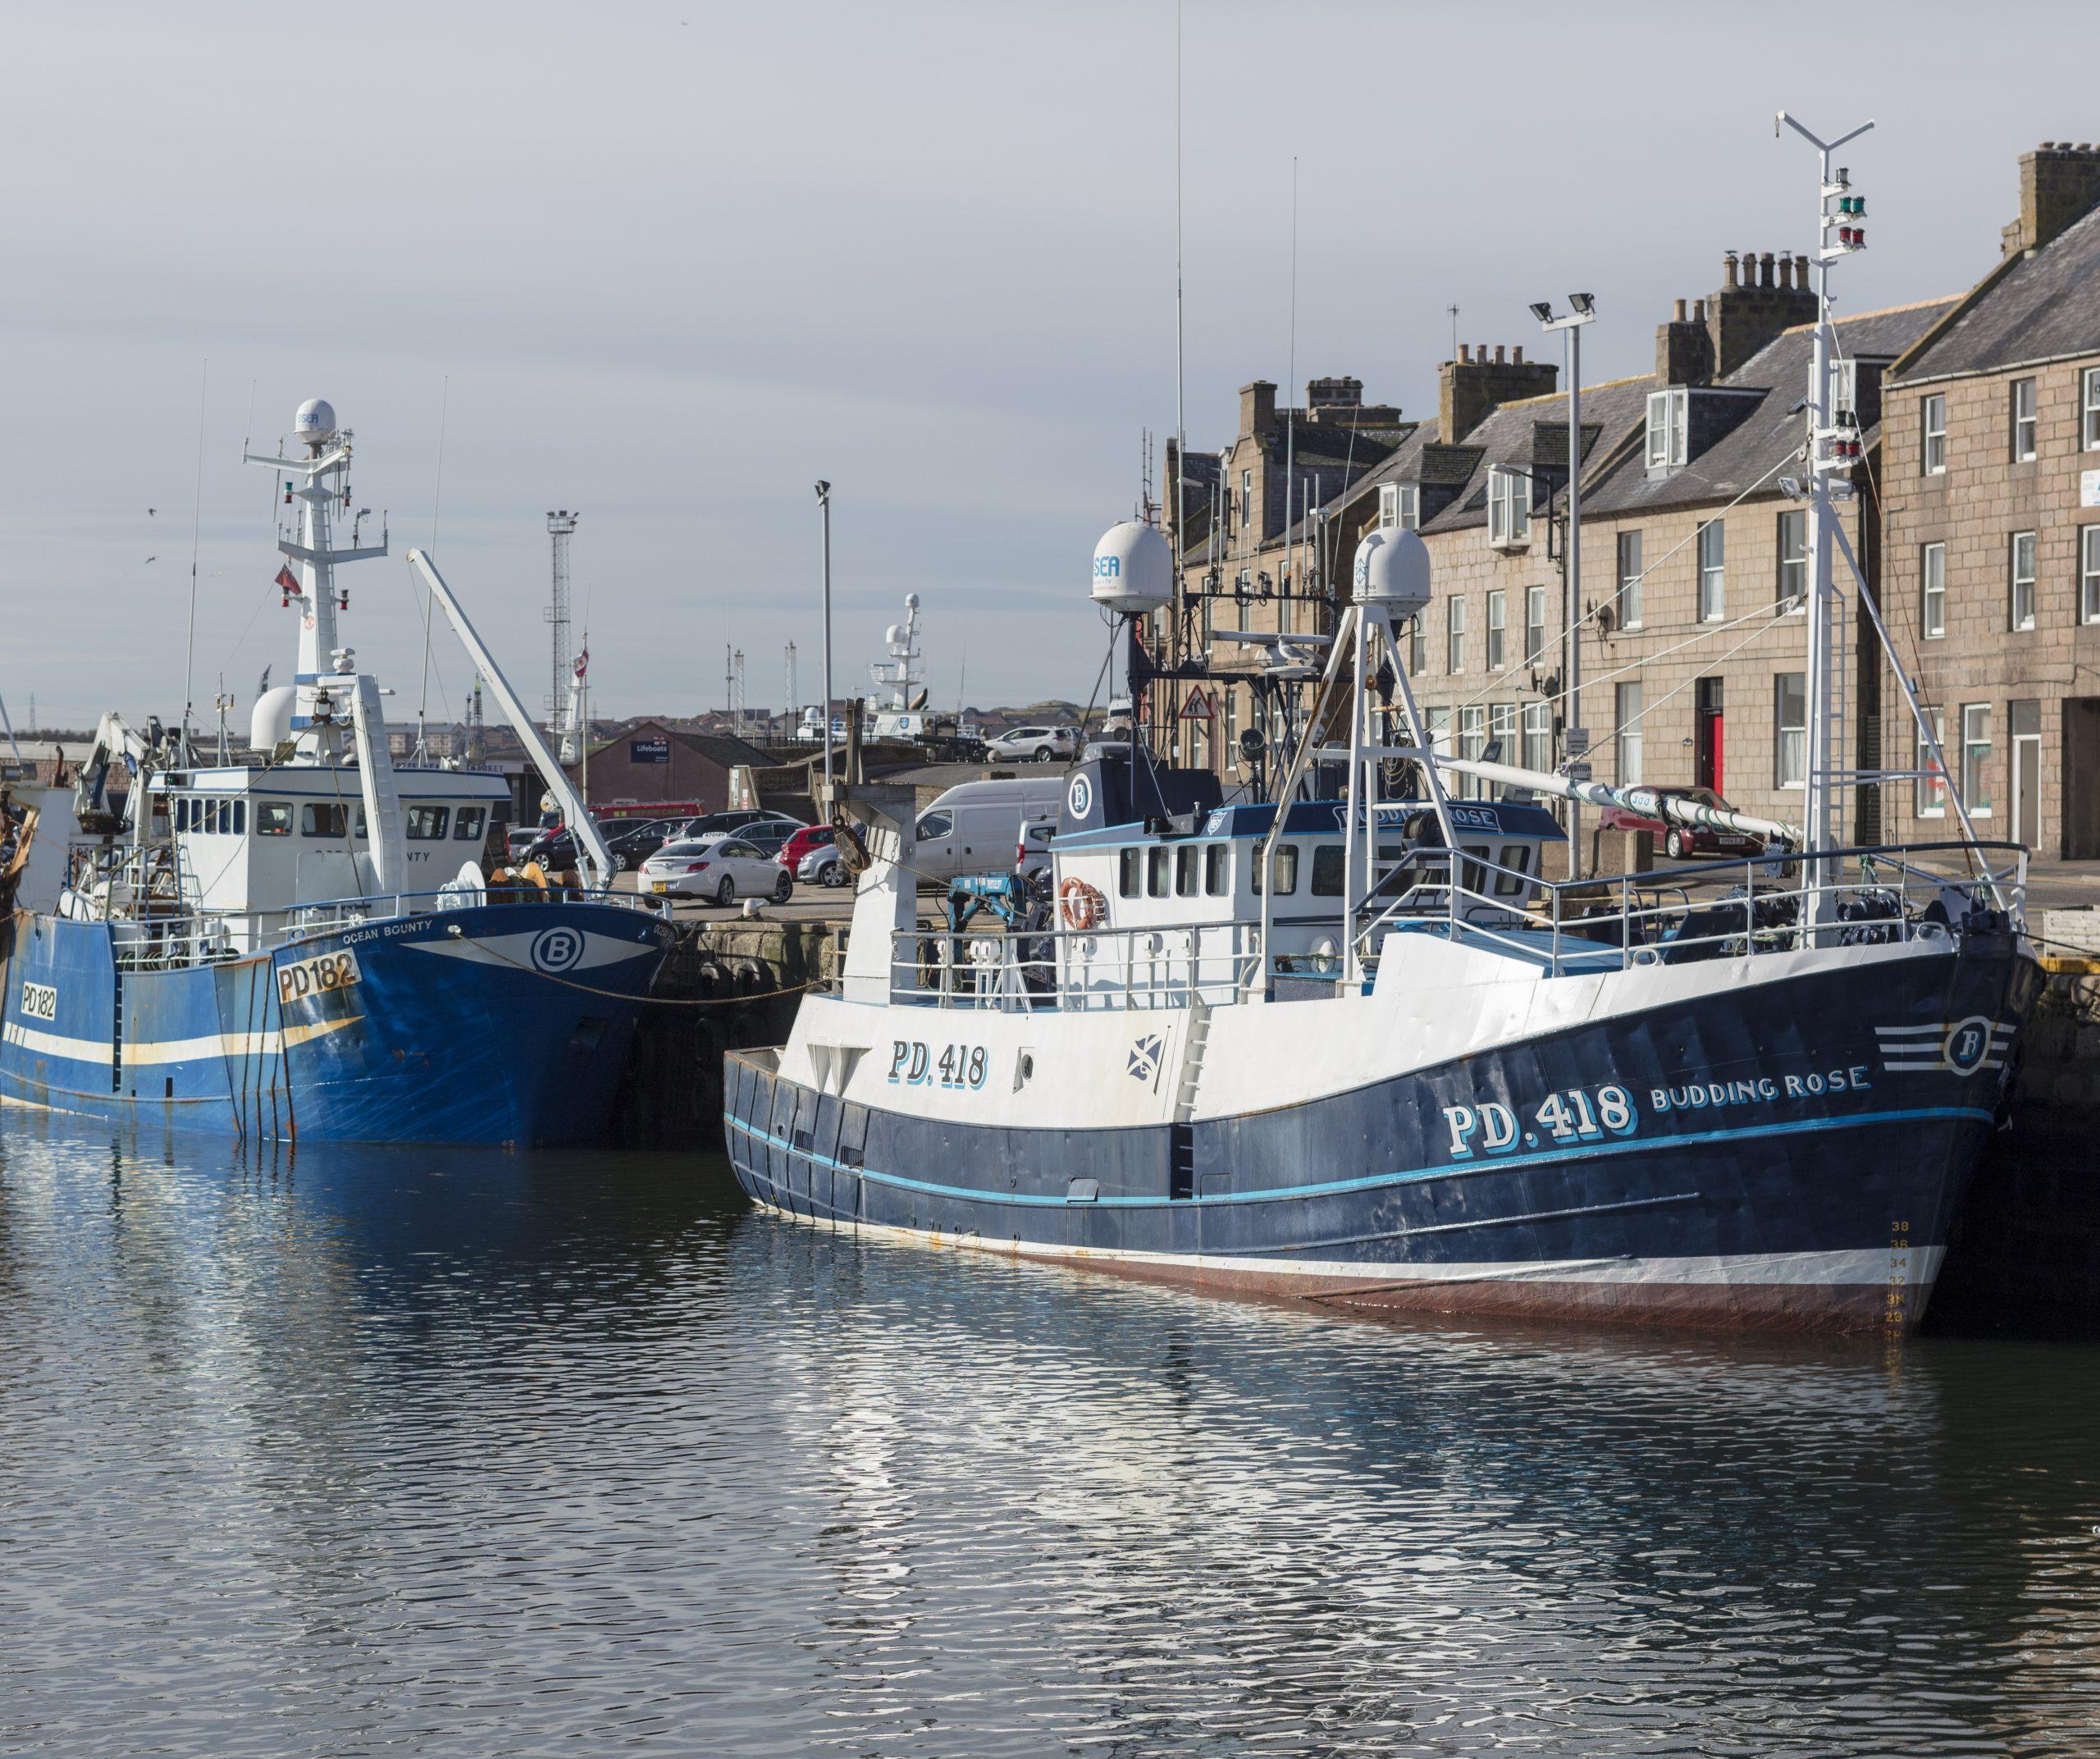 scotland replacement emff